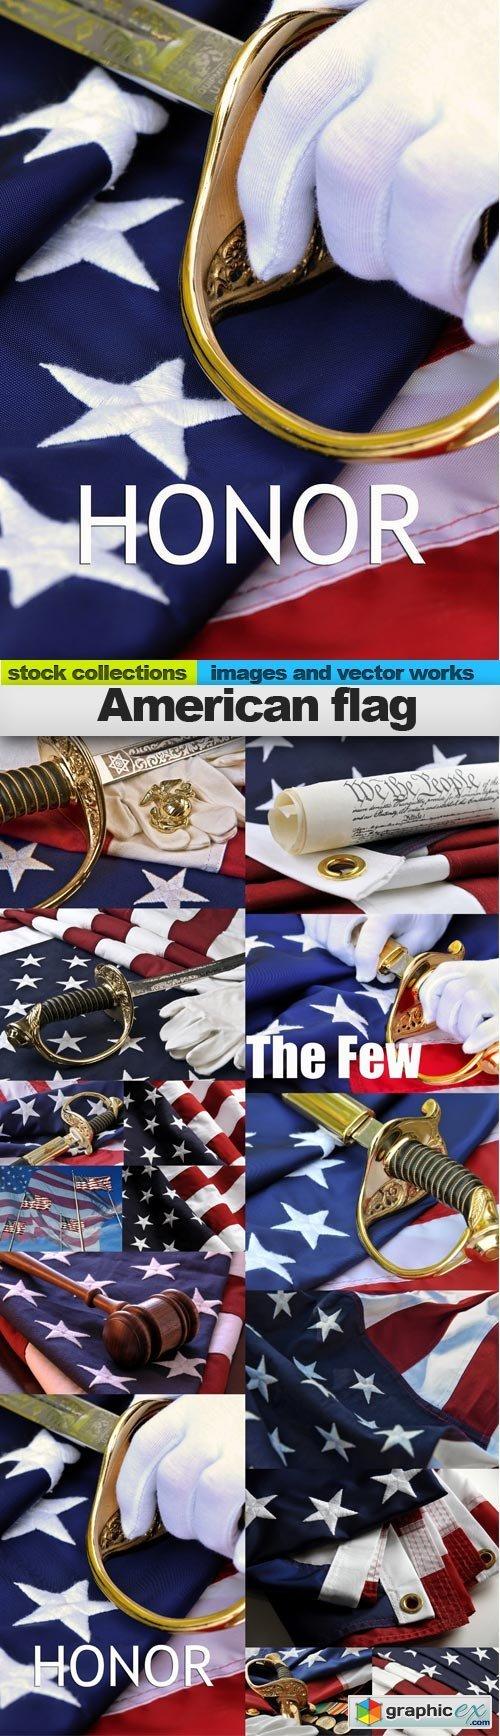 American flag, 15 x UHQ JPEG